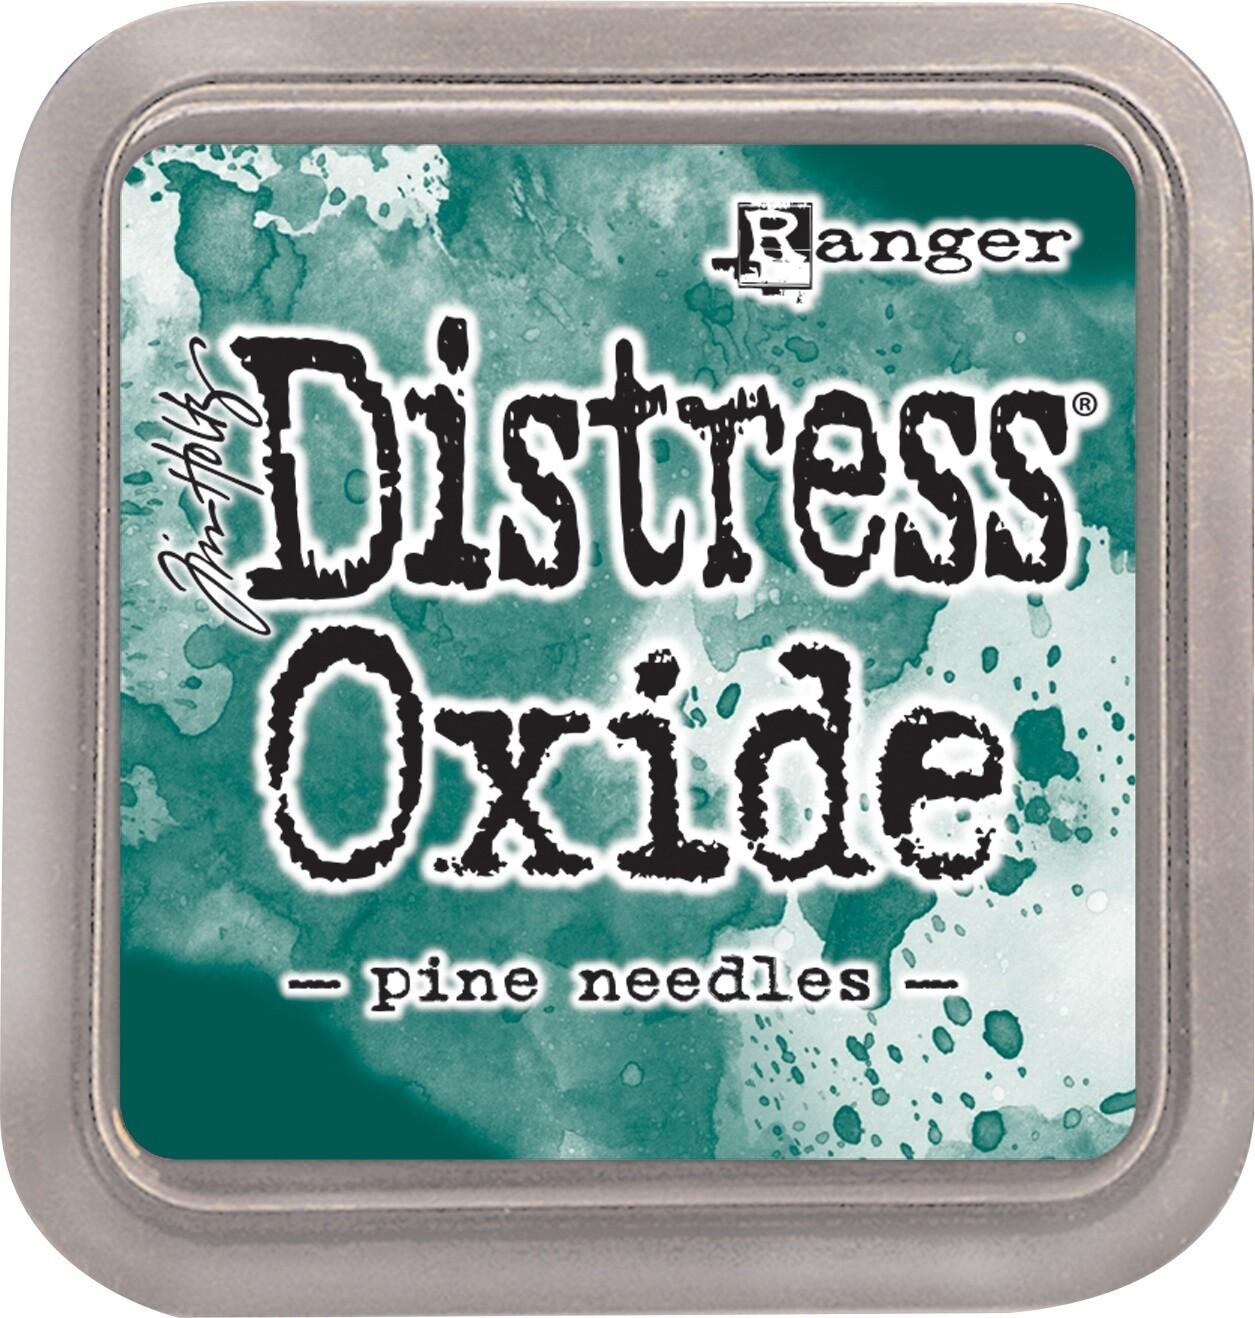 Tim Holtz Distress PINE NEEDLES Oxides Ink Pad